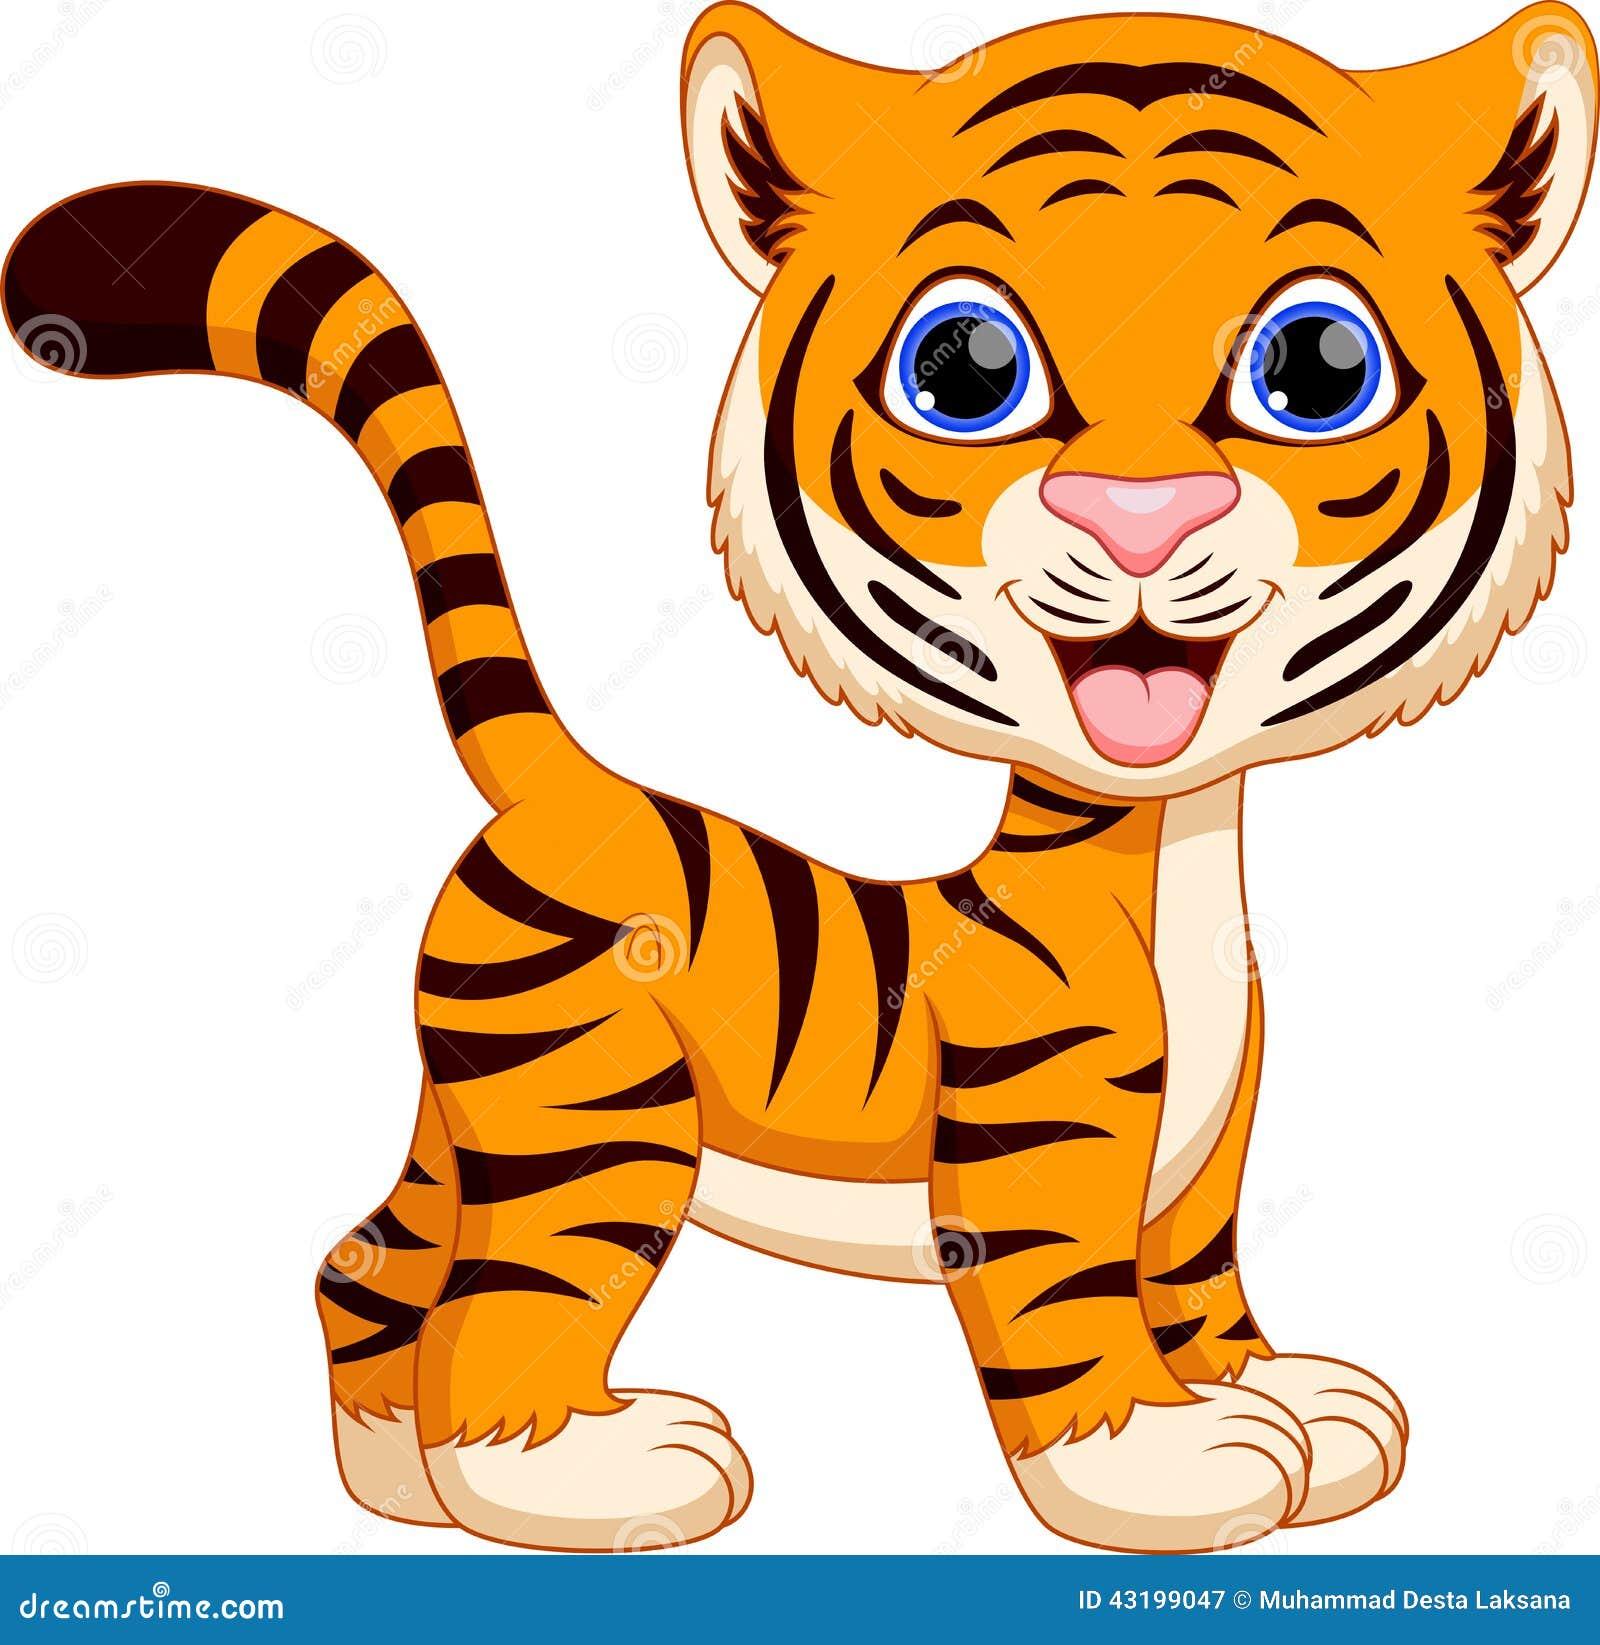 Cute Tiger Cartoon Stock Illustration - Image: 43199047